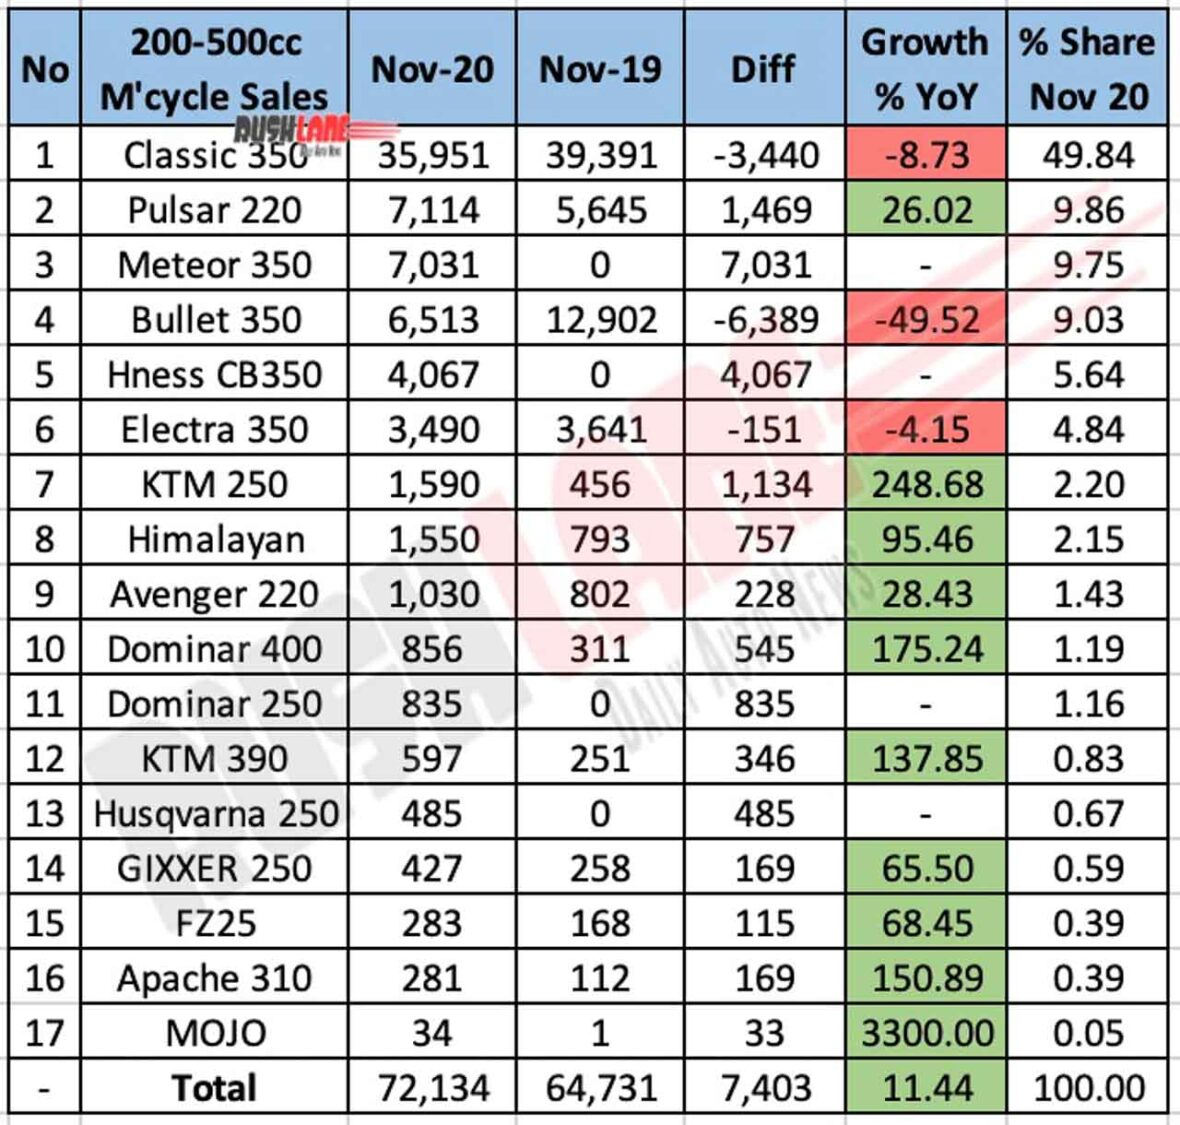 Nov 2020 Motorcycle sales 200cc-500cc segment